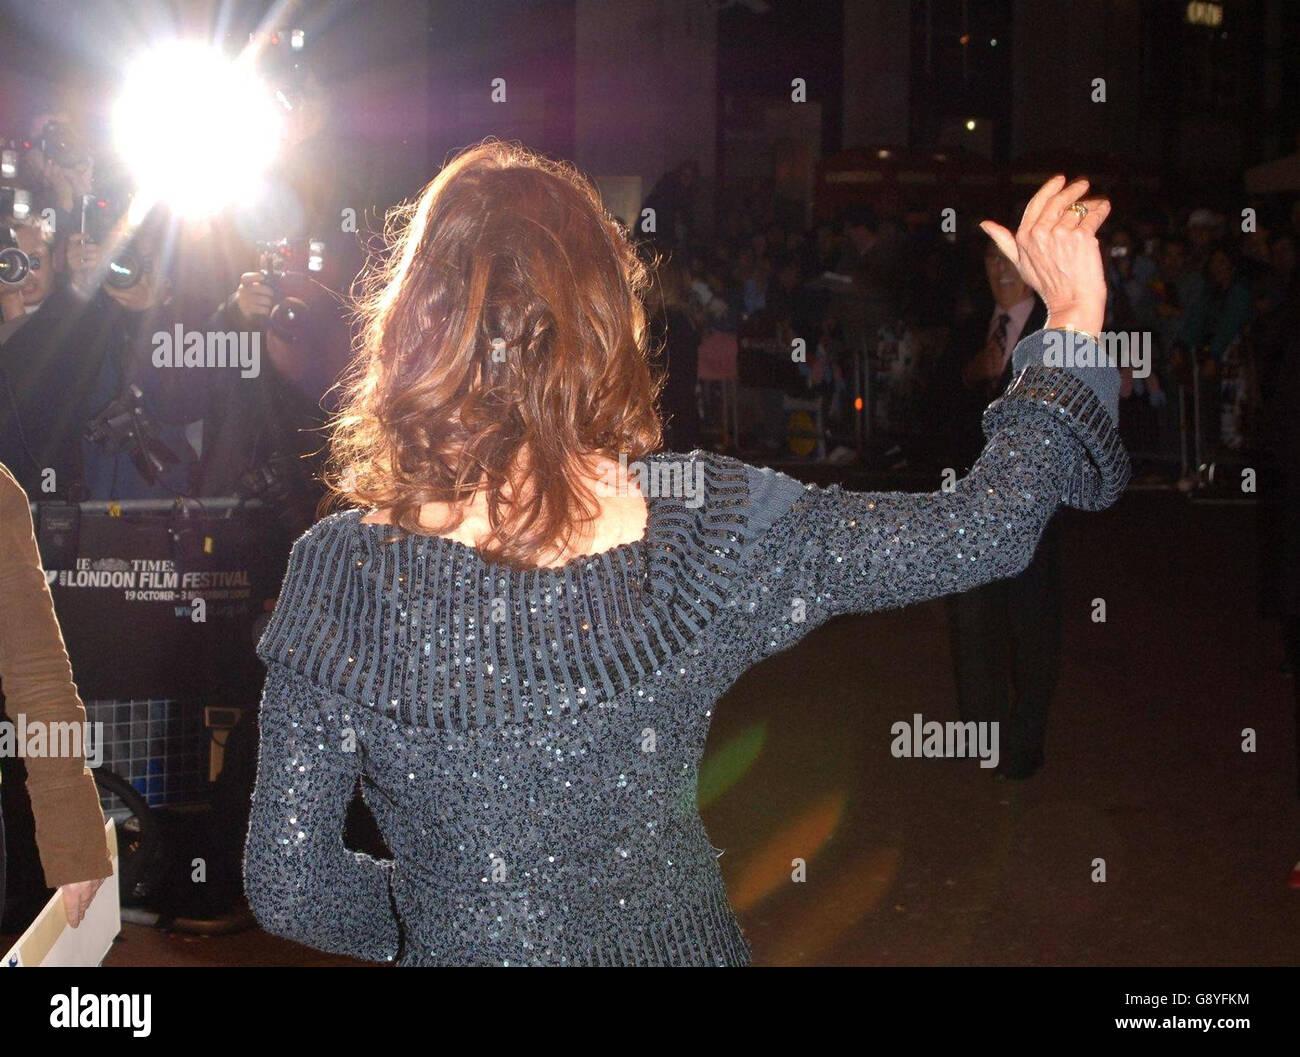 Susan Sarandon Photo Credit High Resolution Stock Photography And Images Alamy